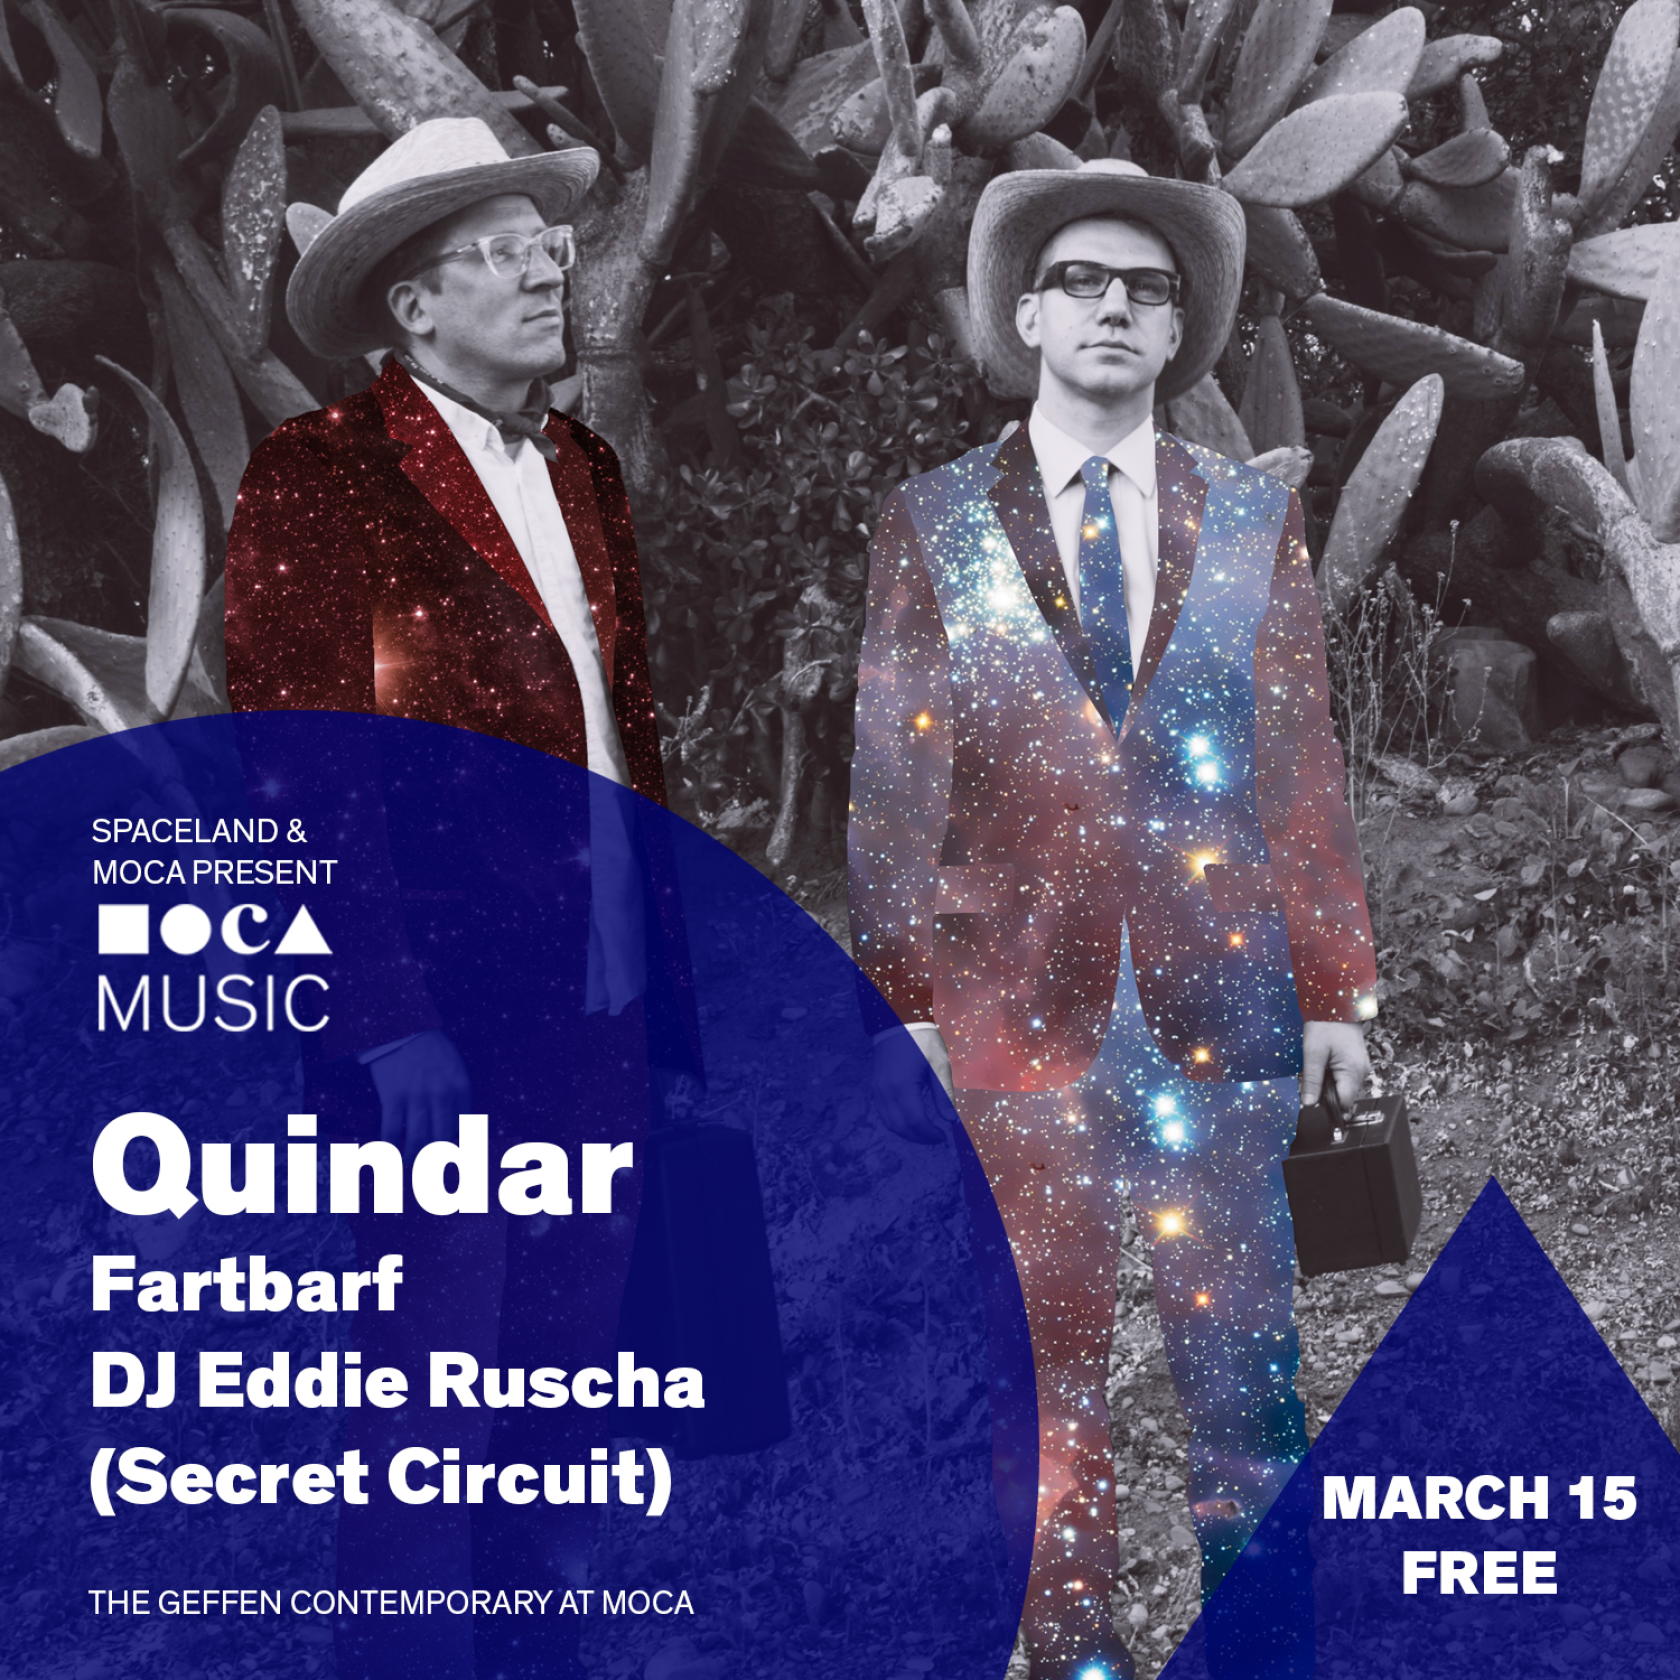 MOCA Music: Quindar, Fartbarf, and DJ Eddie Rusche / Secret Circuit